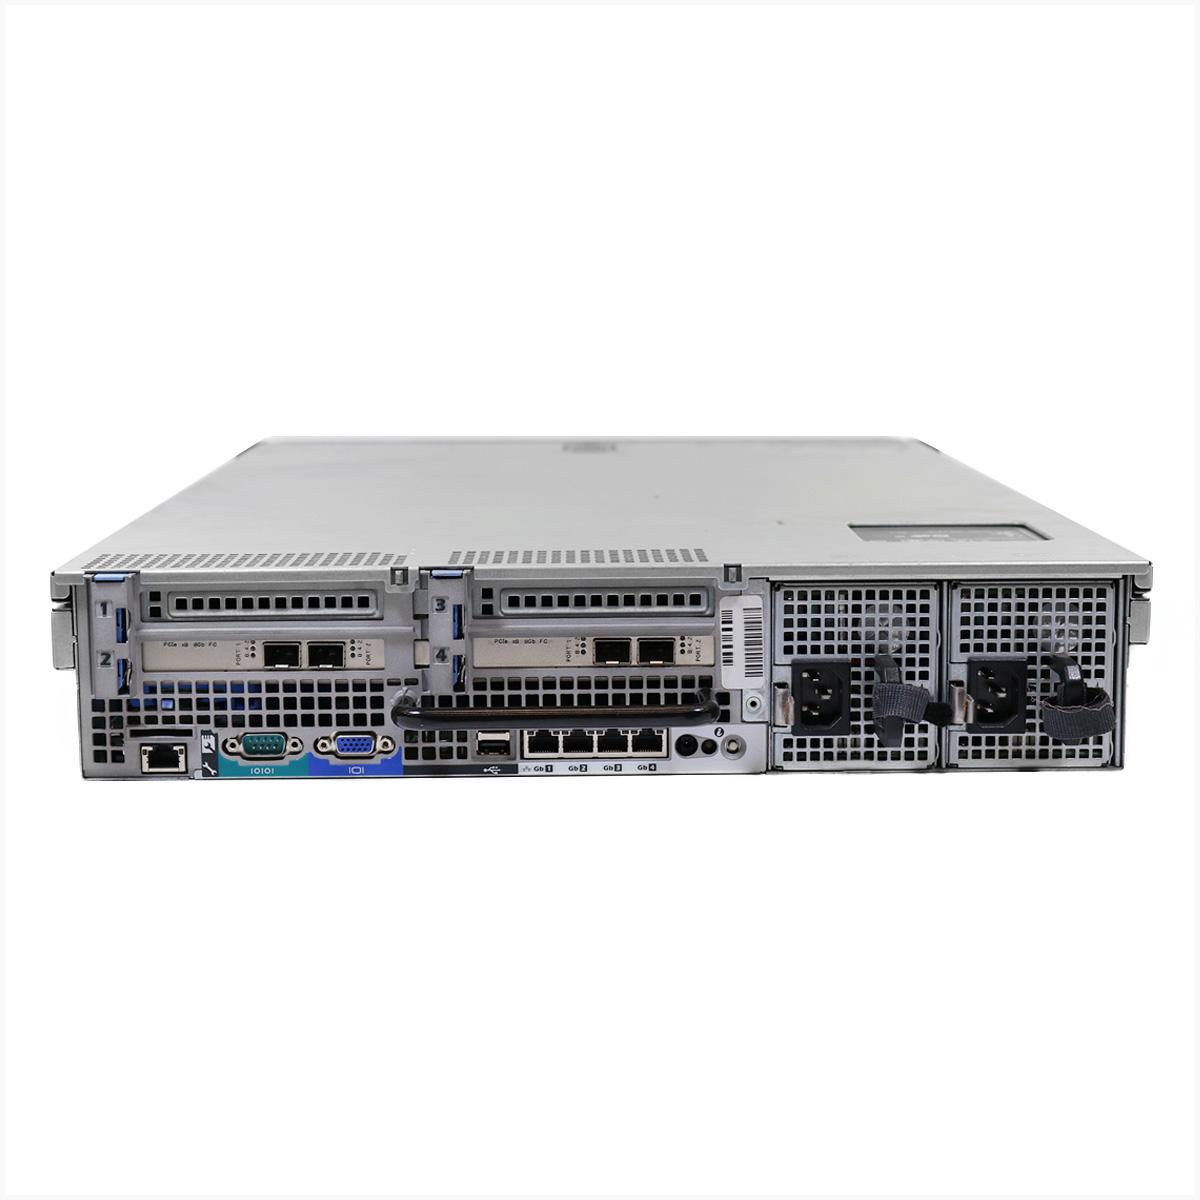 Servidor dell r710 xeon x5675 64gb 2x 1tb - usado